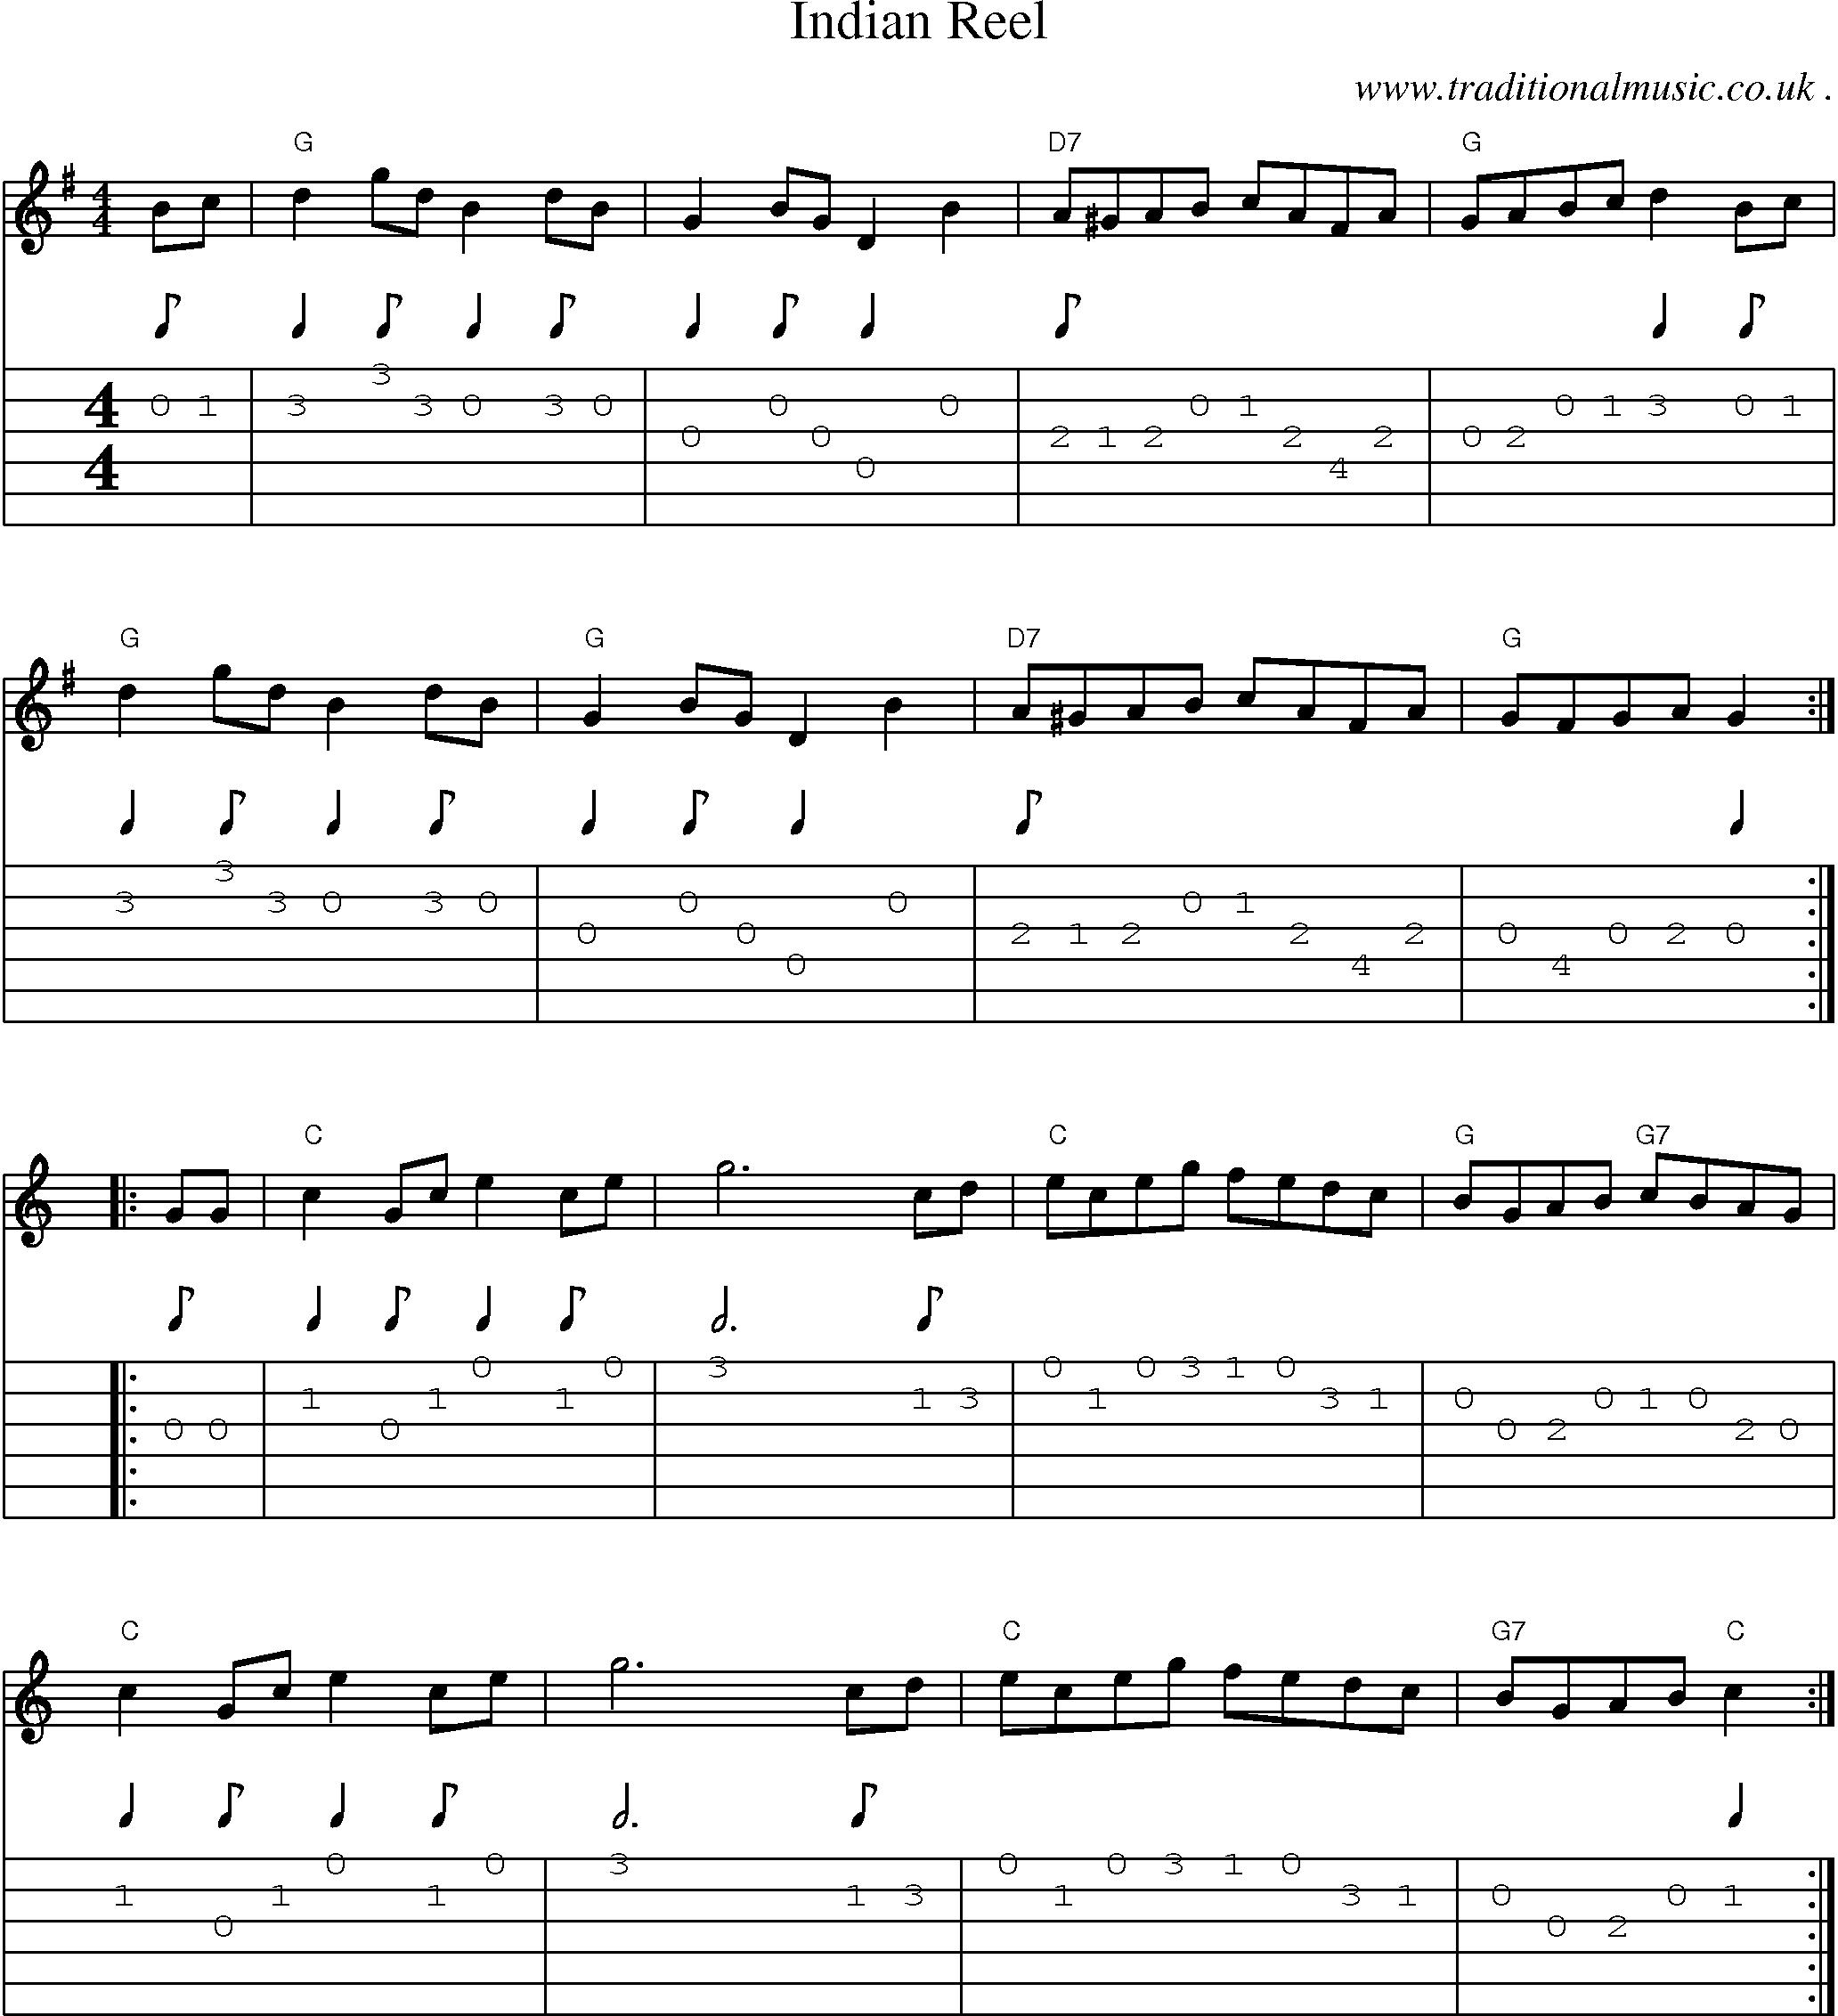 81 Guitar Chords Pdf In Hindi Chords Pdf Hindi Guitar In